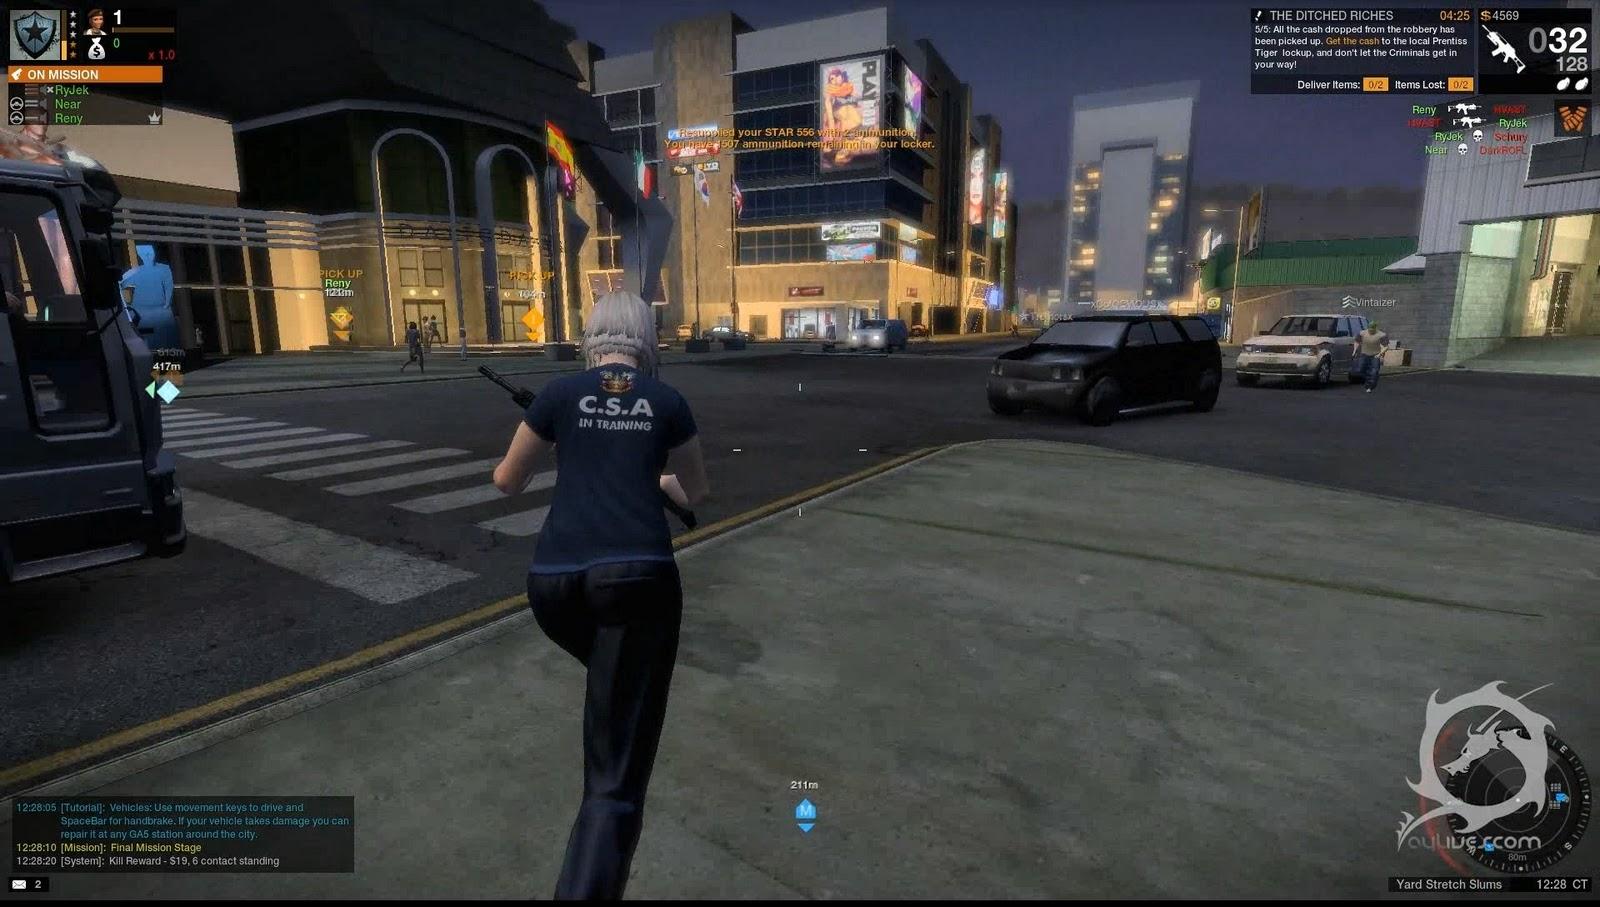 Free Online Games Online Games Apb Reloaded Gta Like